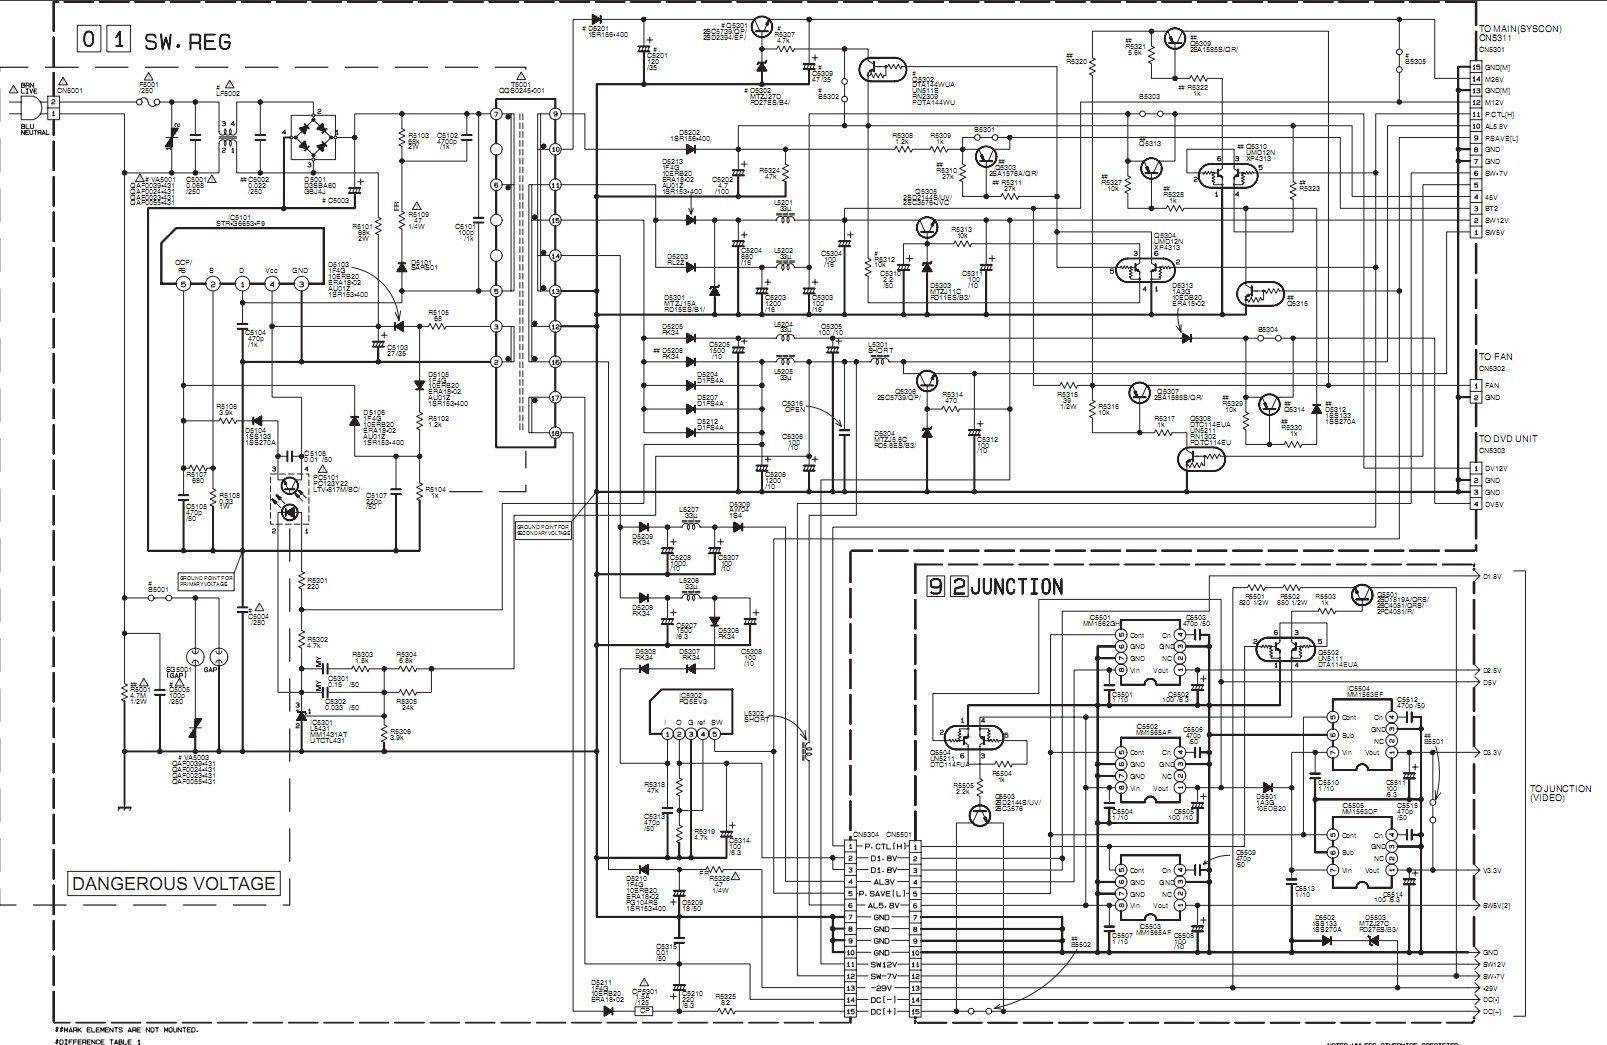 Jvc Tv Diagram Radio Wiring Crt Schematic Diagrams Schematics U2022 Rh Seniorlivinguniversity Co Circuit